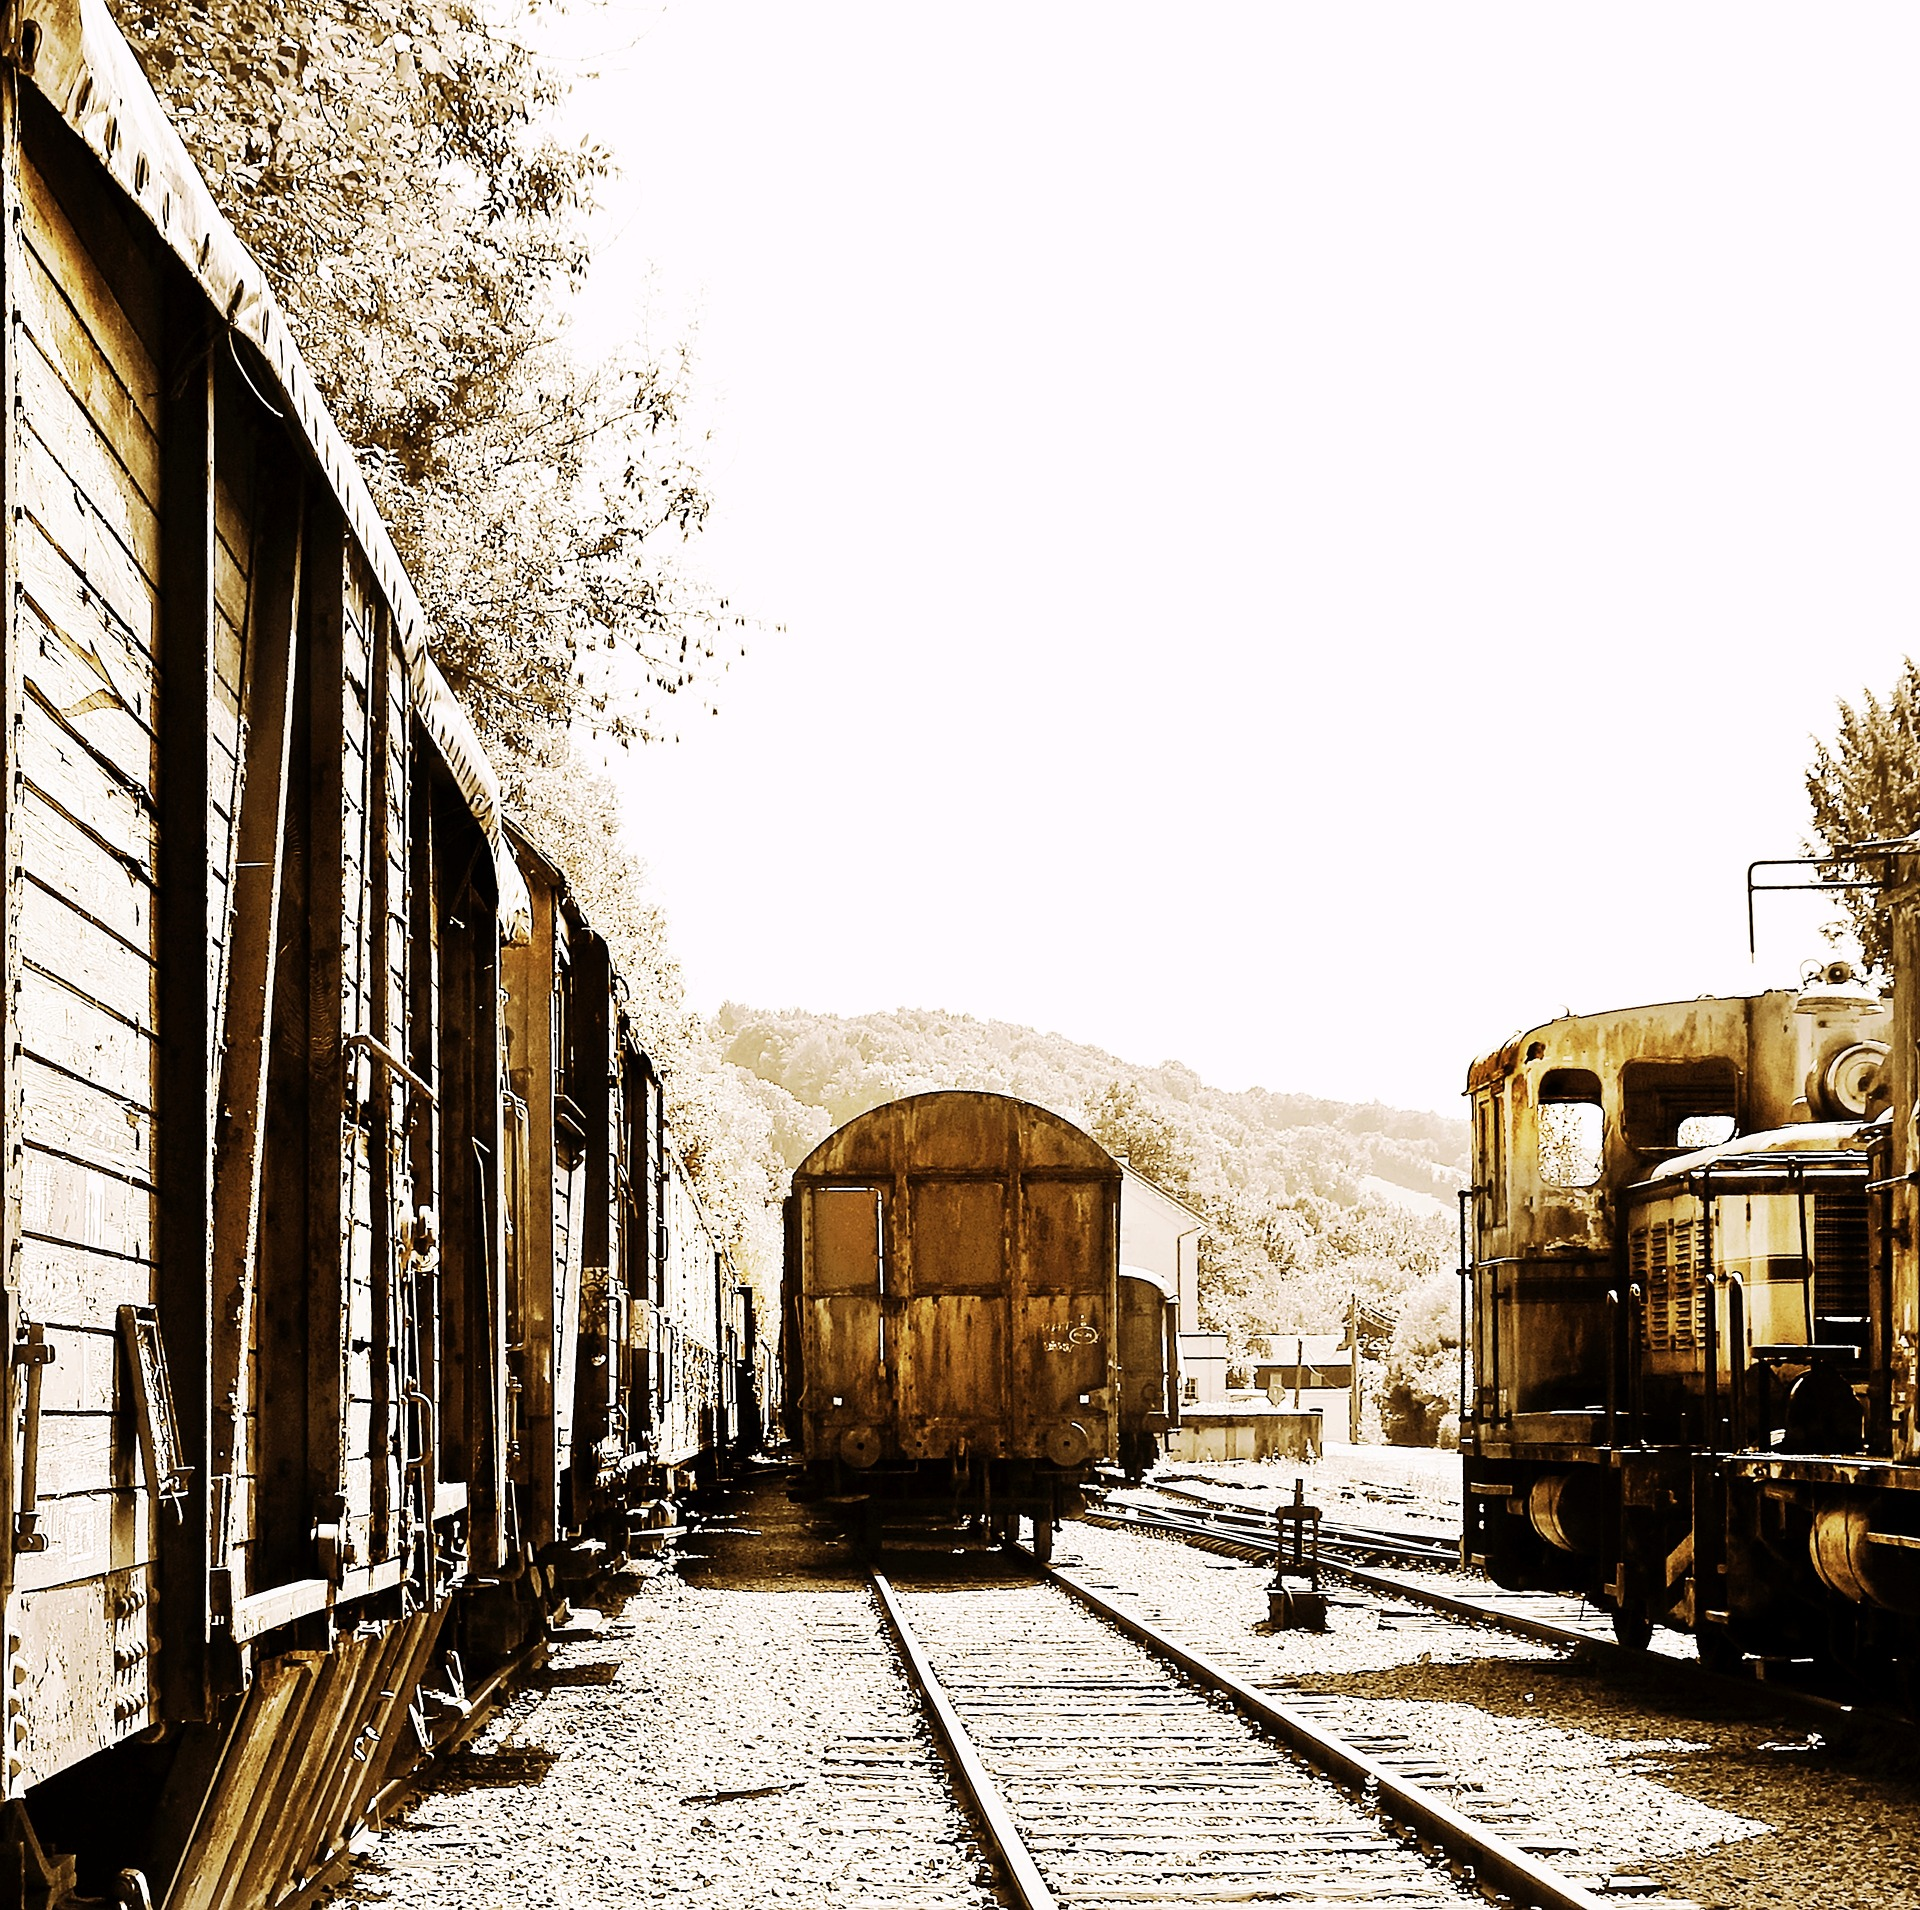 Train Service, Journey, Metal, Metallic, Service, HQ Photo